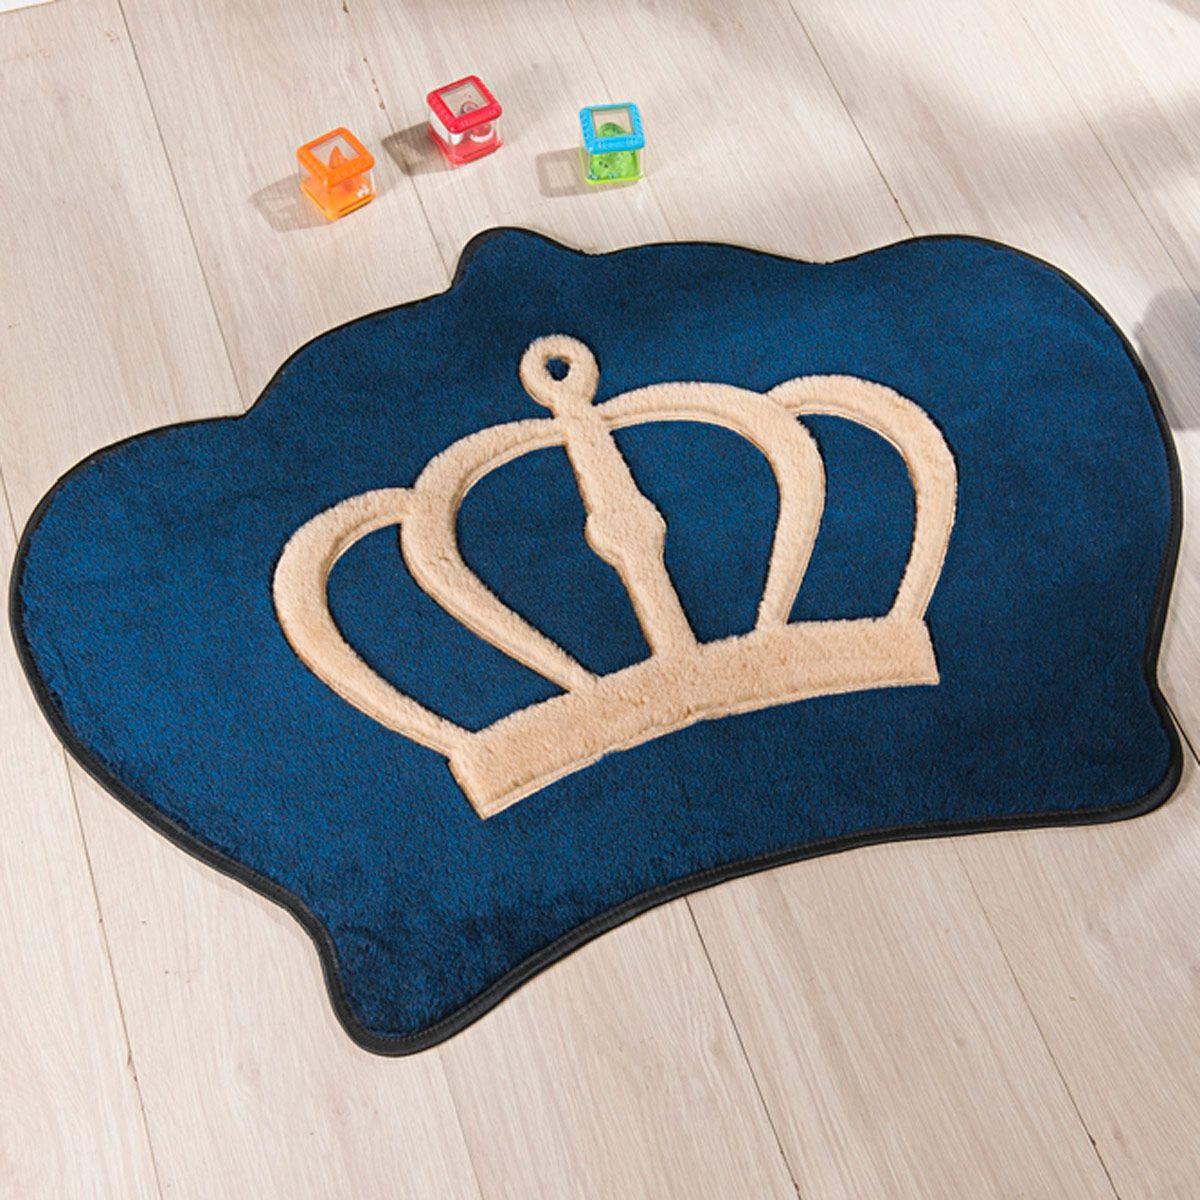 Tapete Big Infantil Premium Formato Coroa Azul Marinho 1,16m x 0,90m